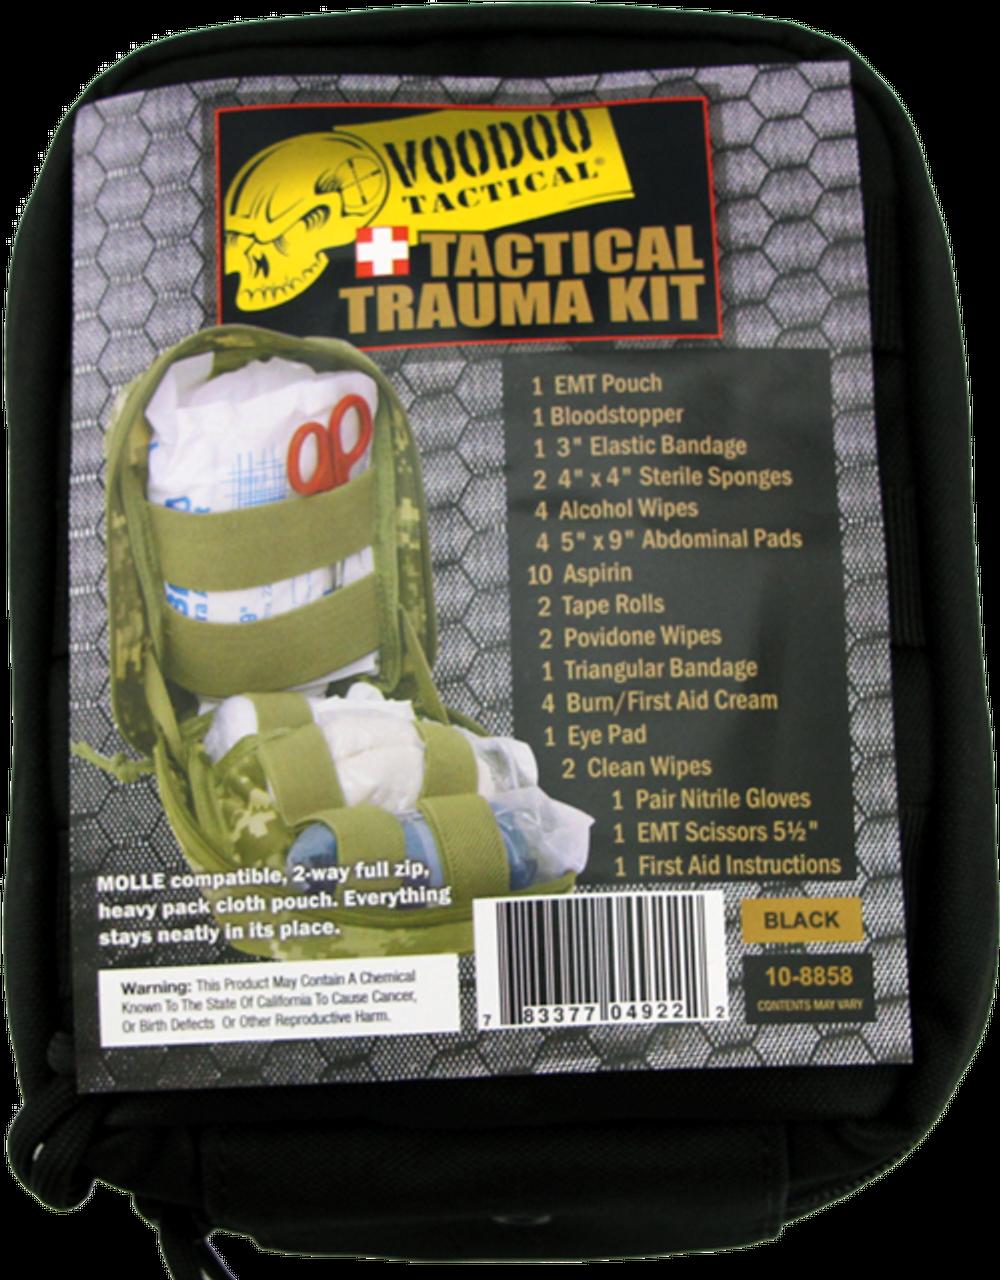 Voodoo Tactical Trauma Kit